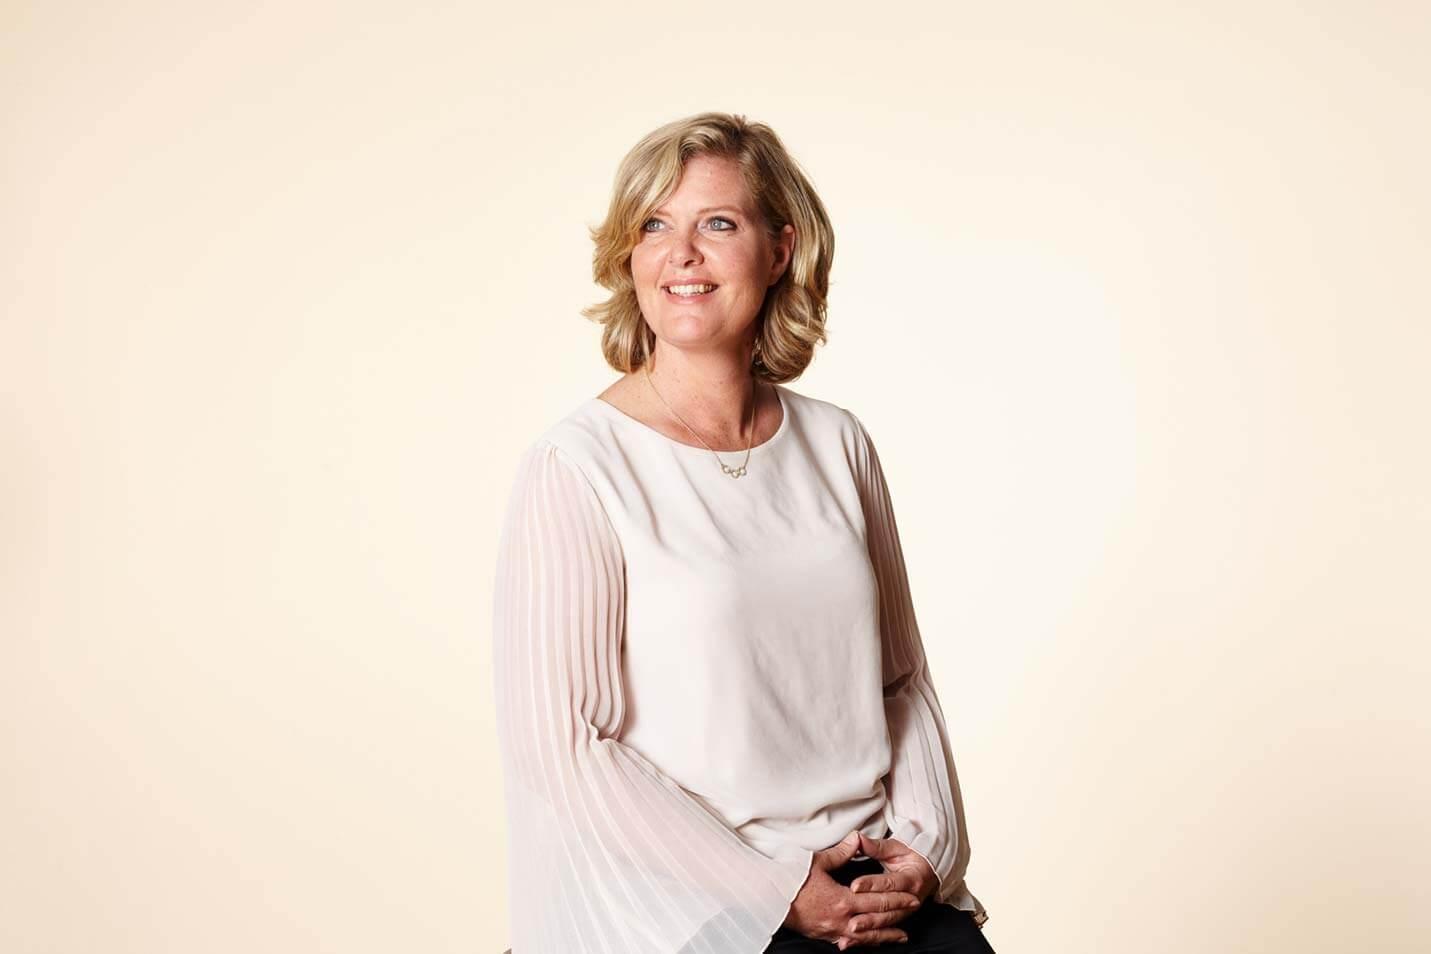 Lesley Fockema Andreae-Mulder